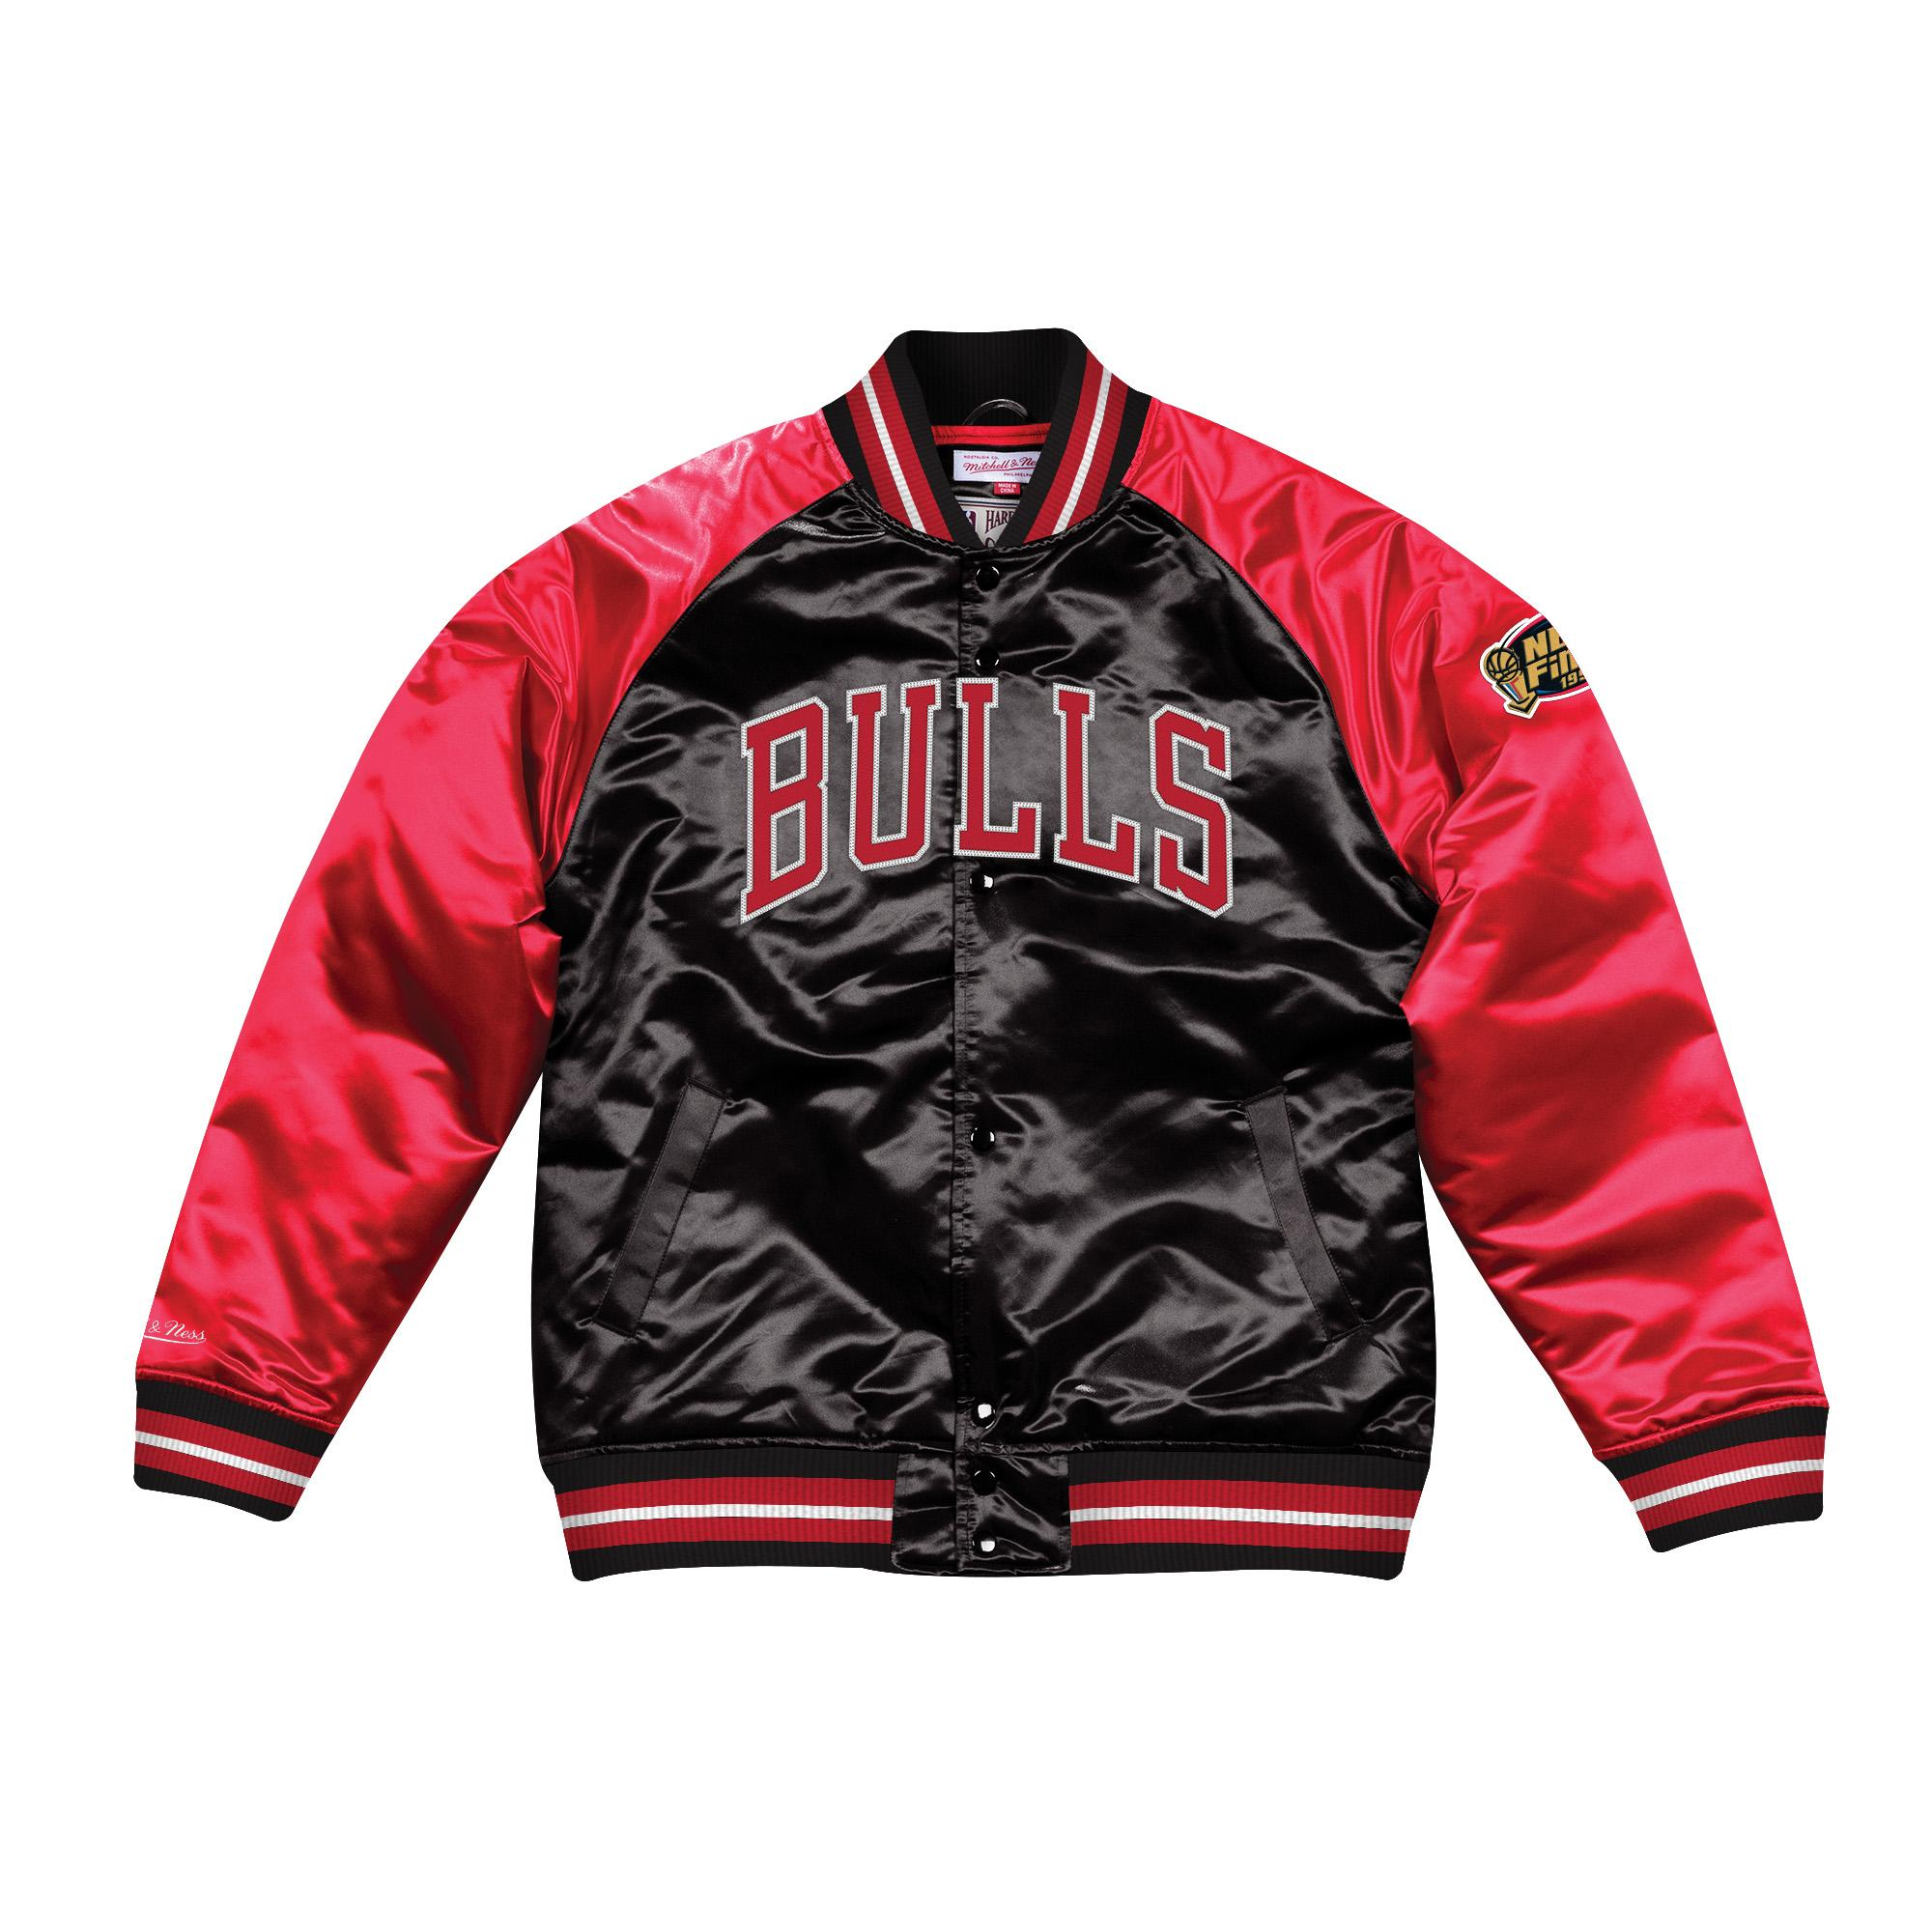 69008b1a4 Mitchell & Ness | Chicago Bulls Tough Season Satin Jacket